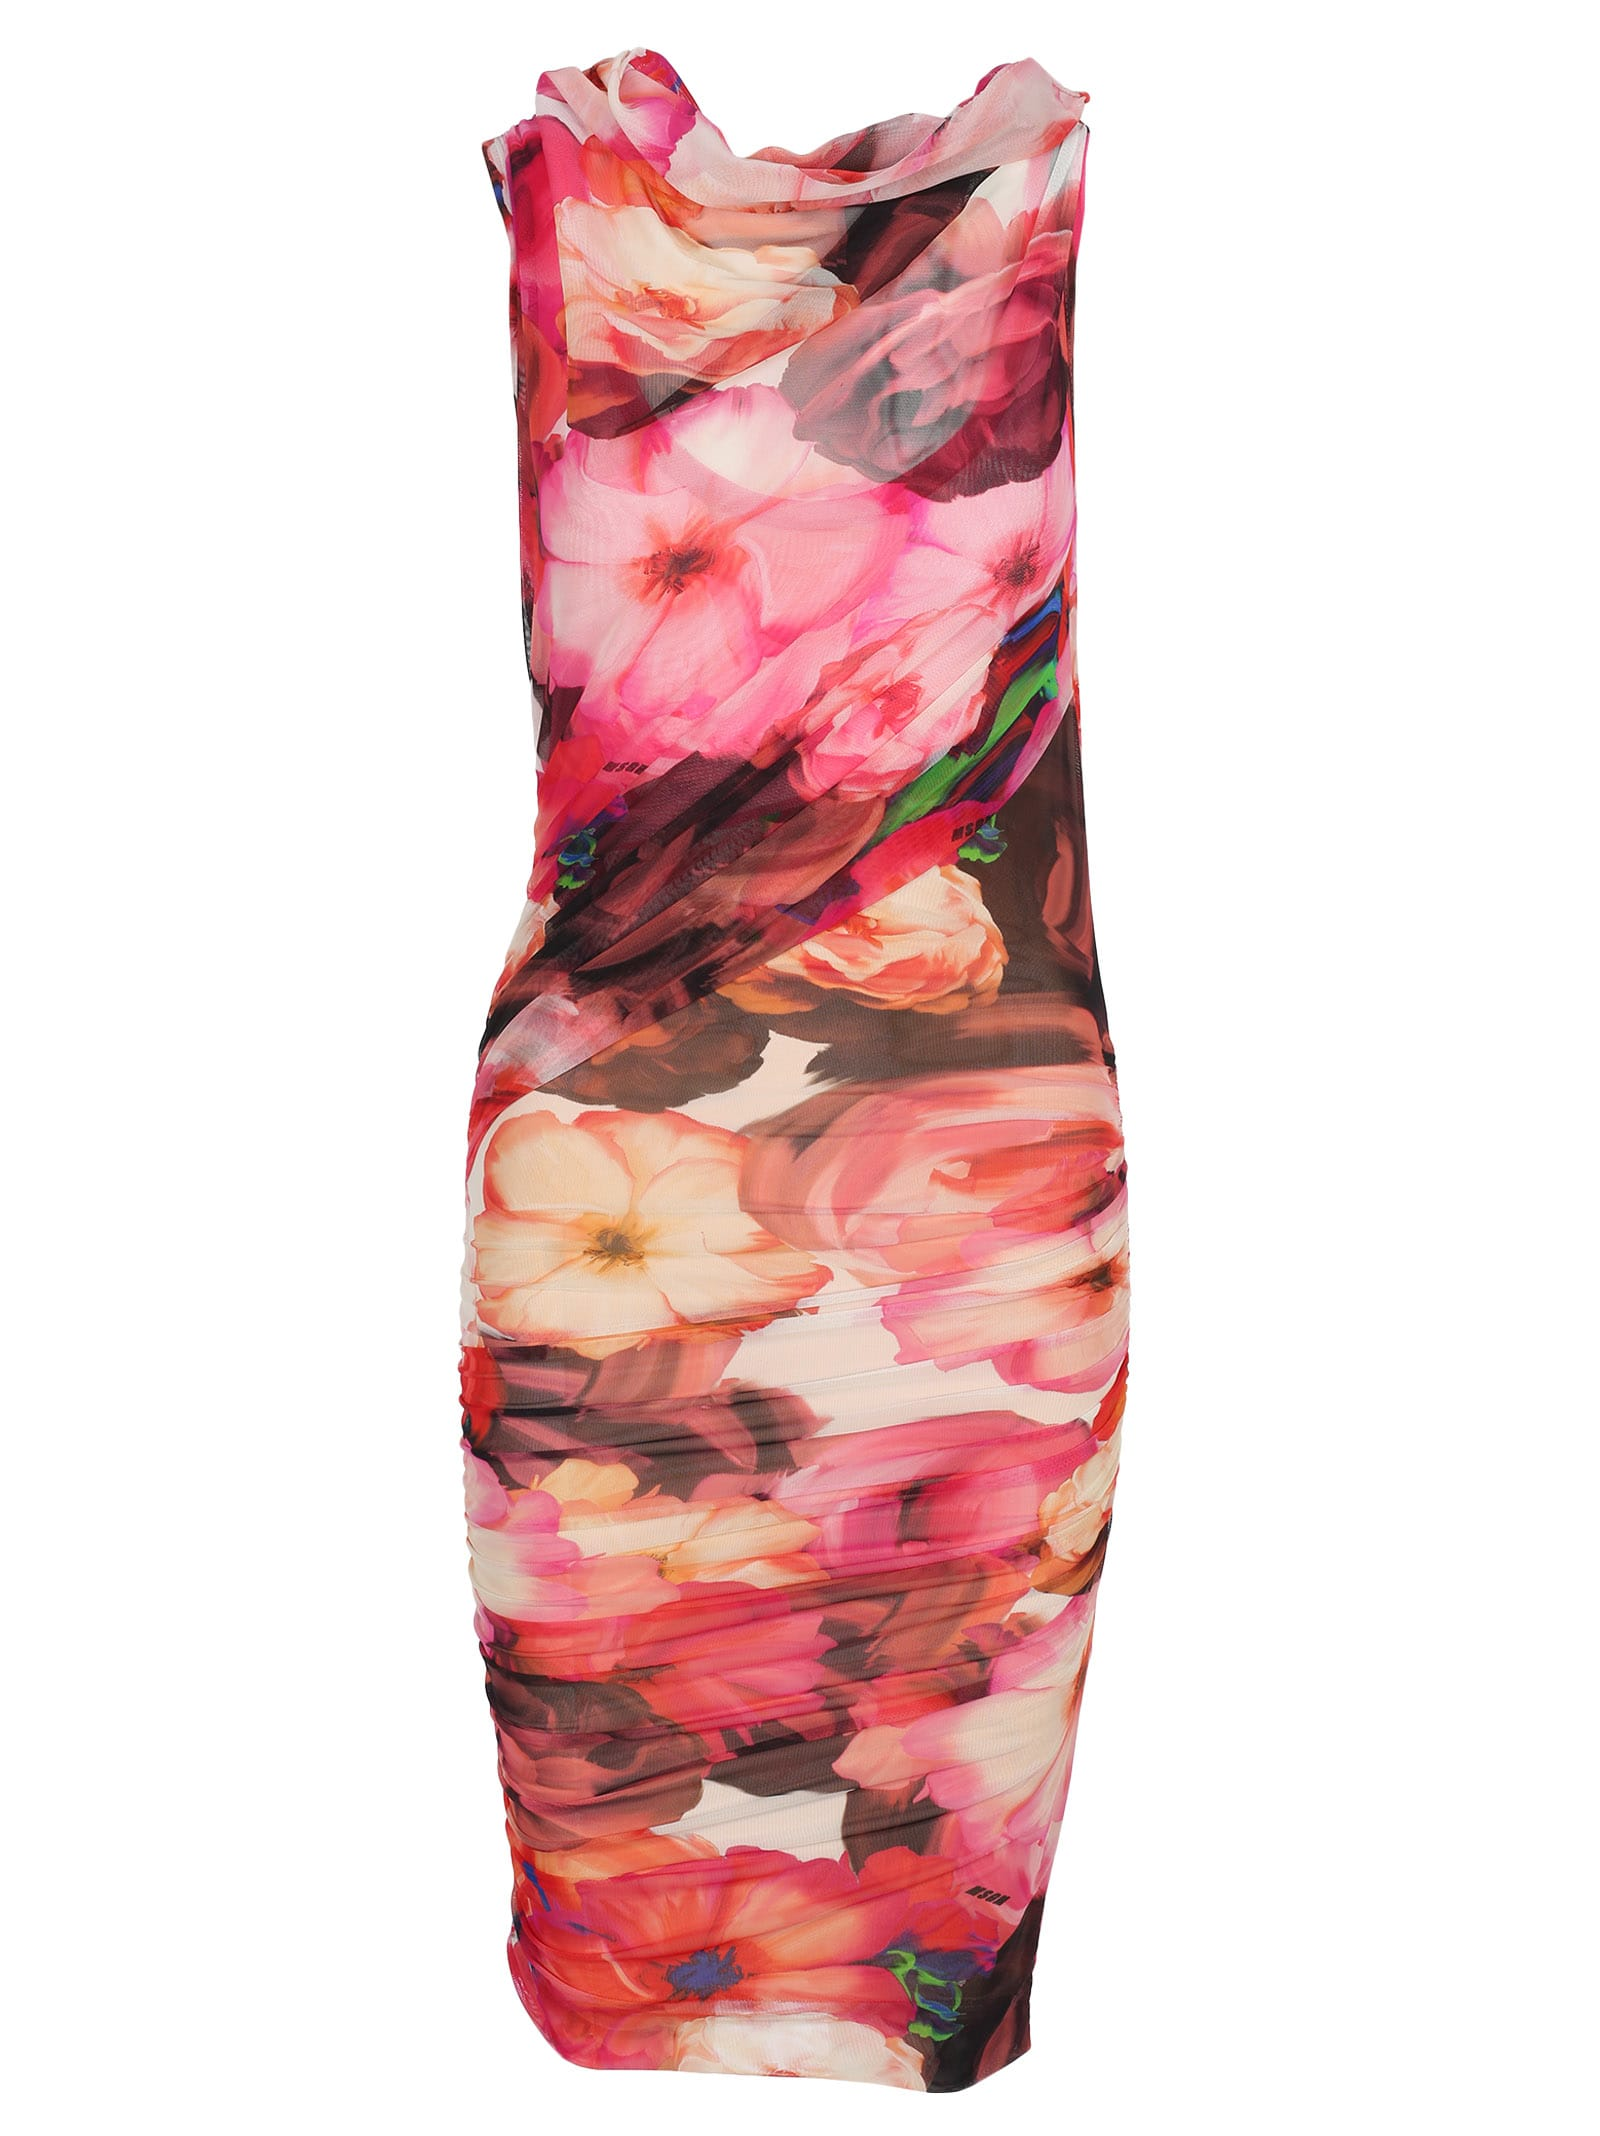 Msgm Msgm Floral Print Ruched Dress